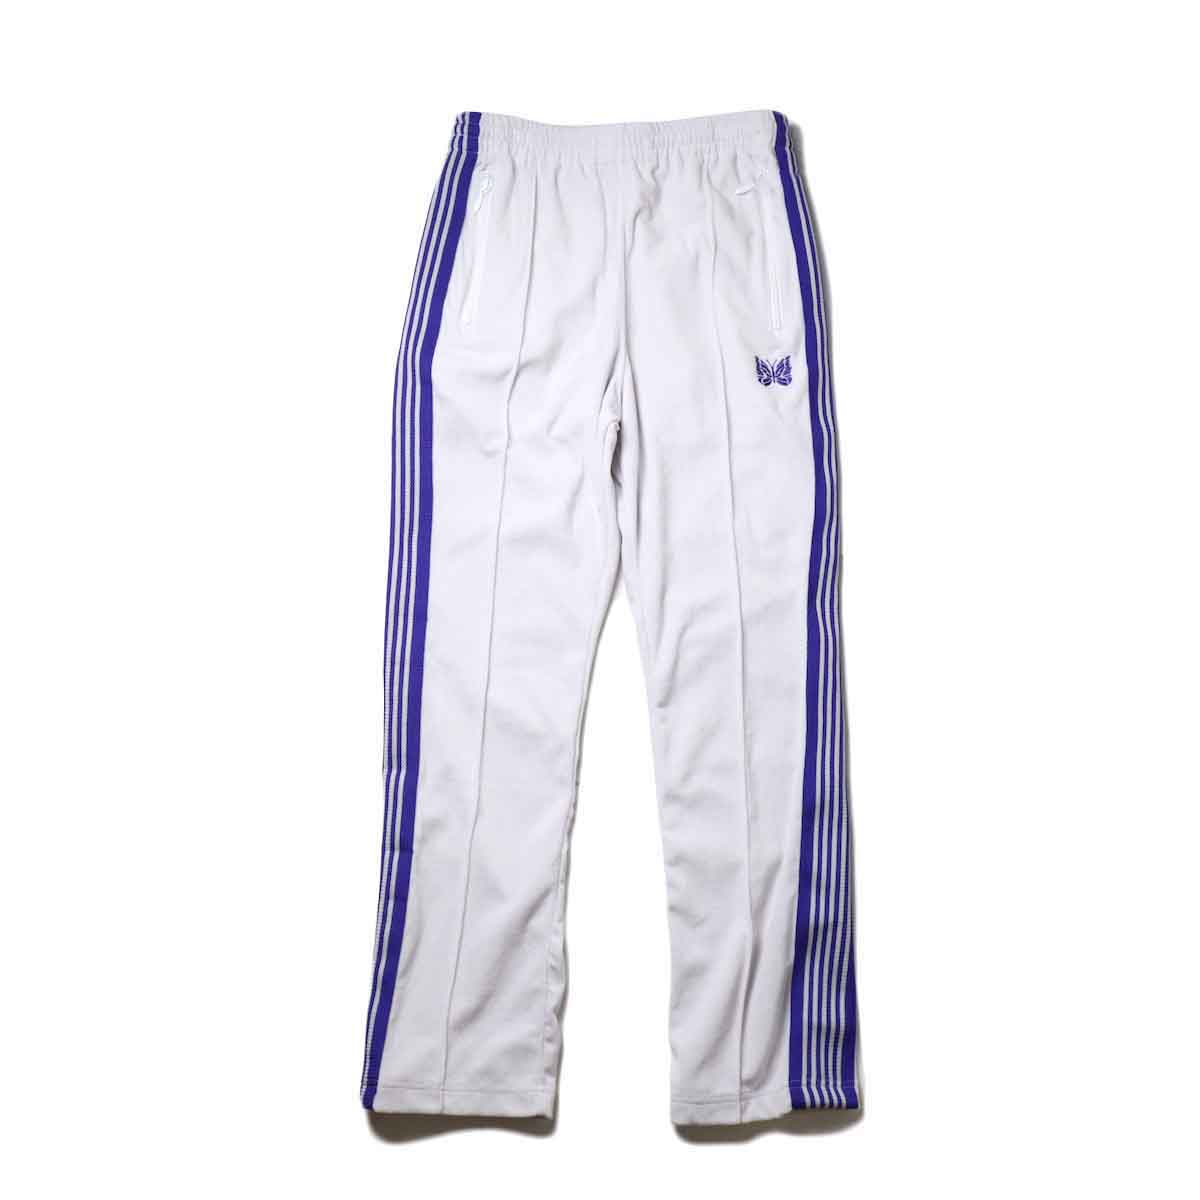 Needles / Narrow Track Pant -C/Pe Velour (White)